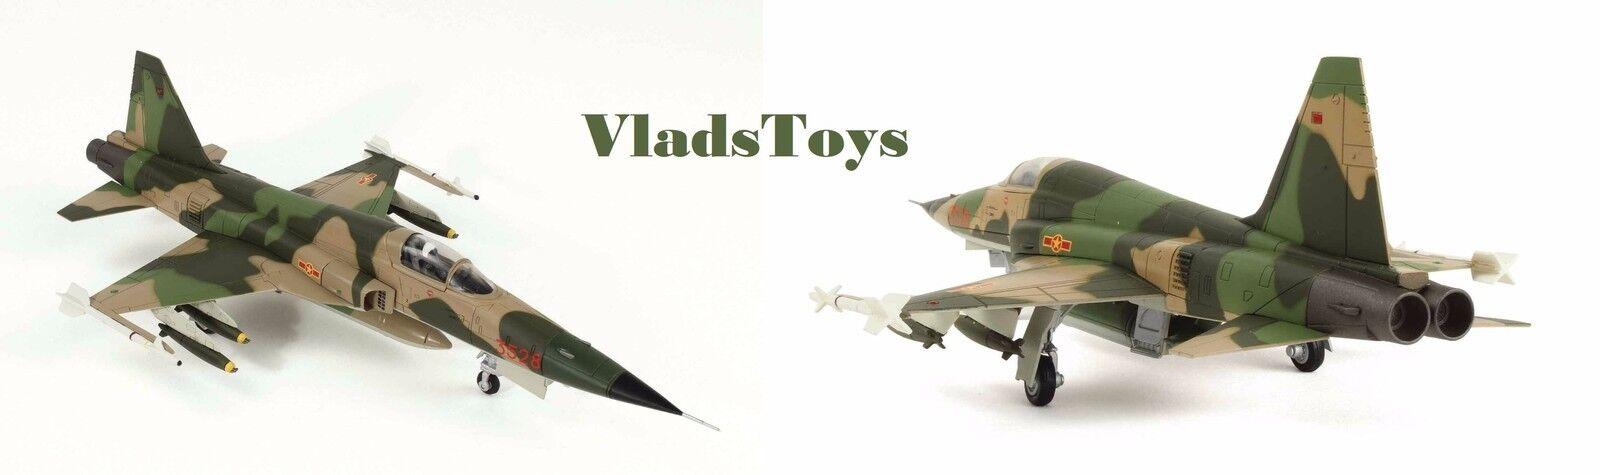 venta Hobby Hobby Hobby Master 1 72 F-5E Tiger II VPAF 935th rojo 3528 Bien Hao AB Vietnam HA3327  sin mínimo